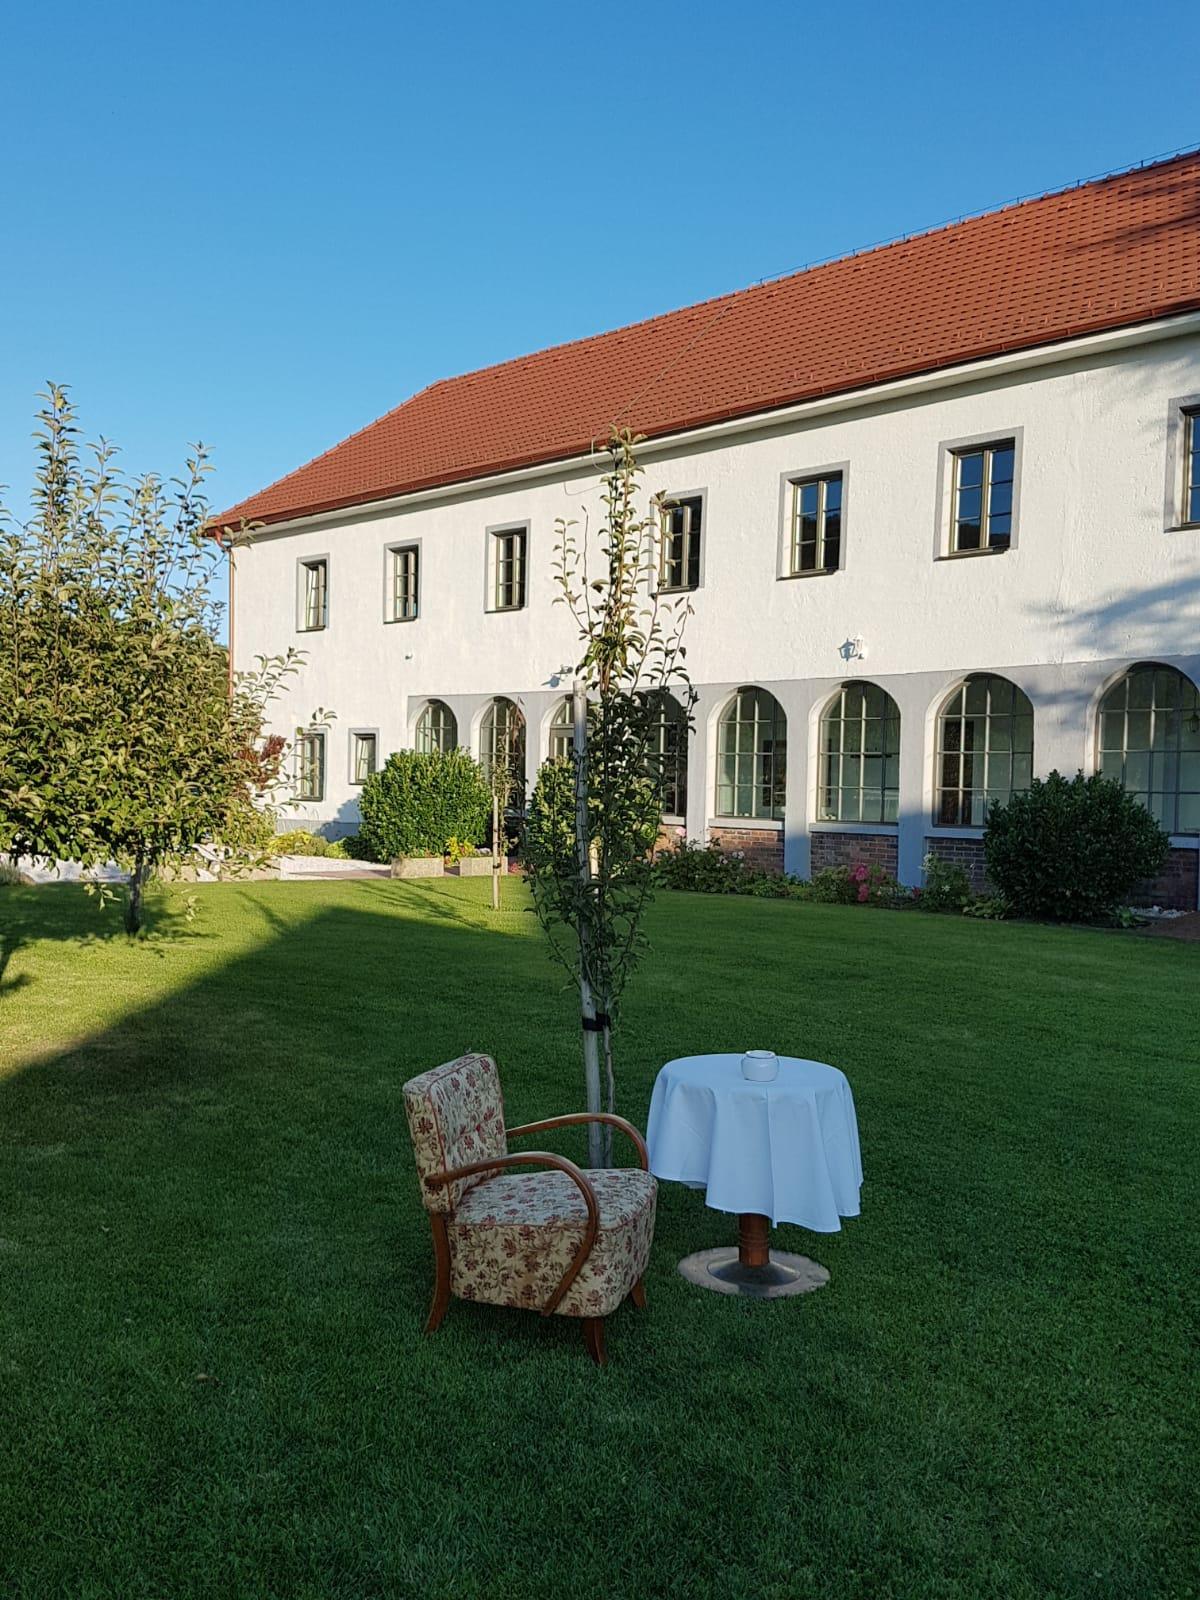 Svadba vo Wiegerovej vile - Wiegerova vila- exteriér